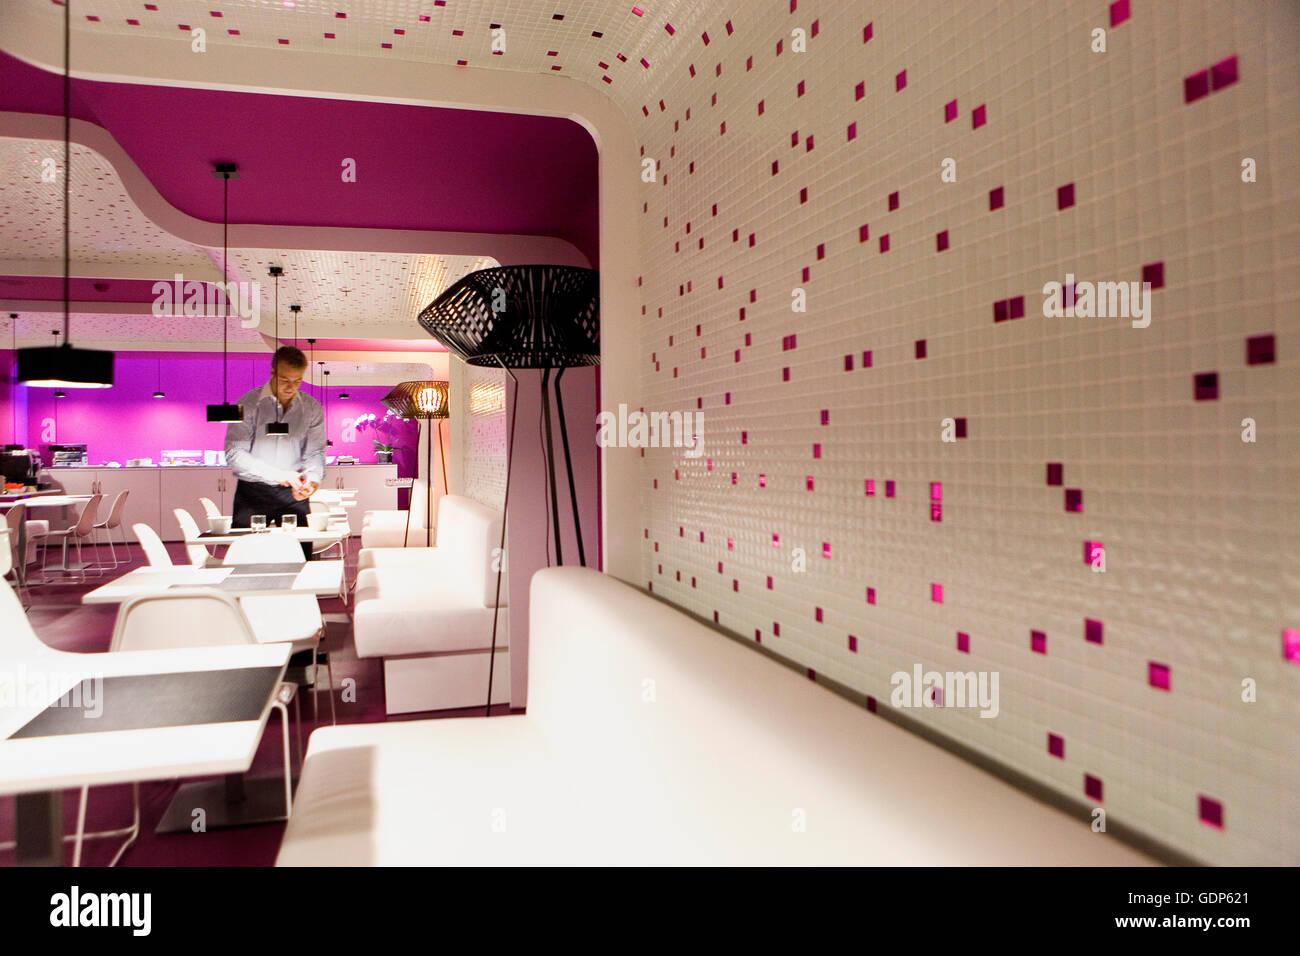 restaurant of roommate hotel emma rosell 205932 385 606 barcelona catalonia